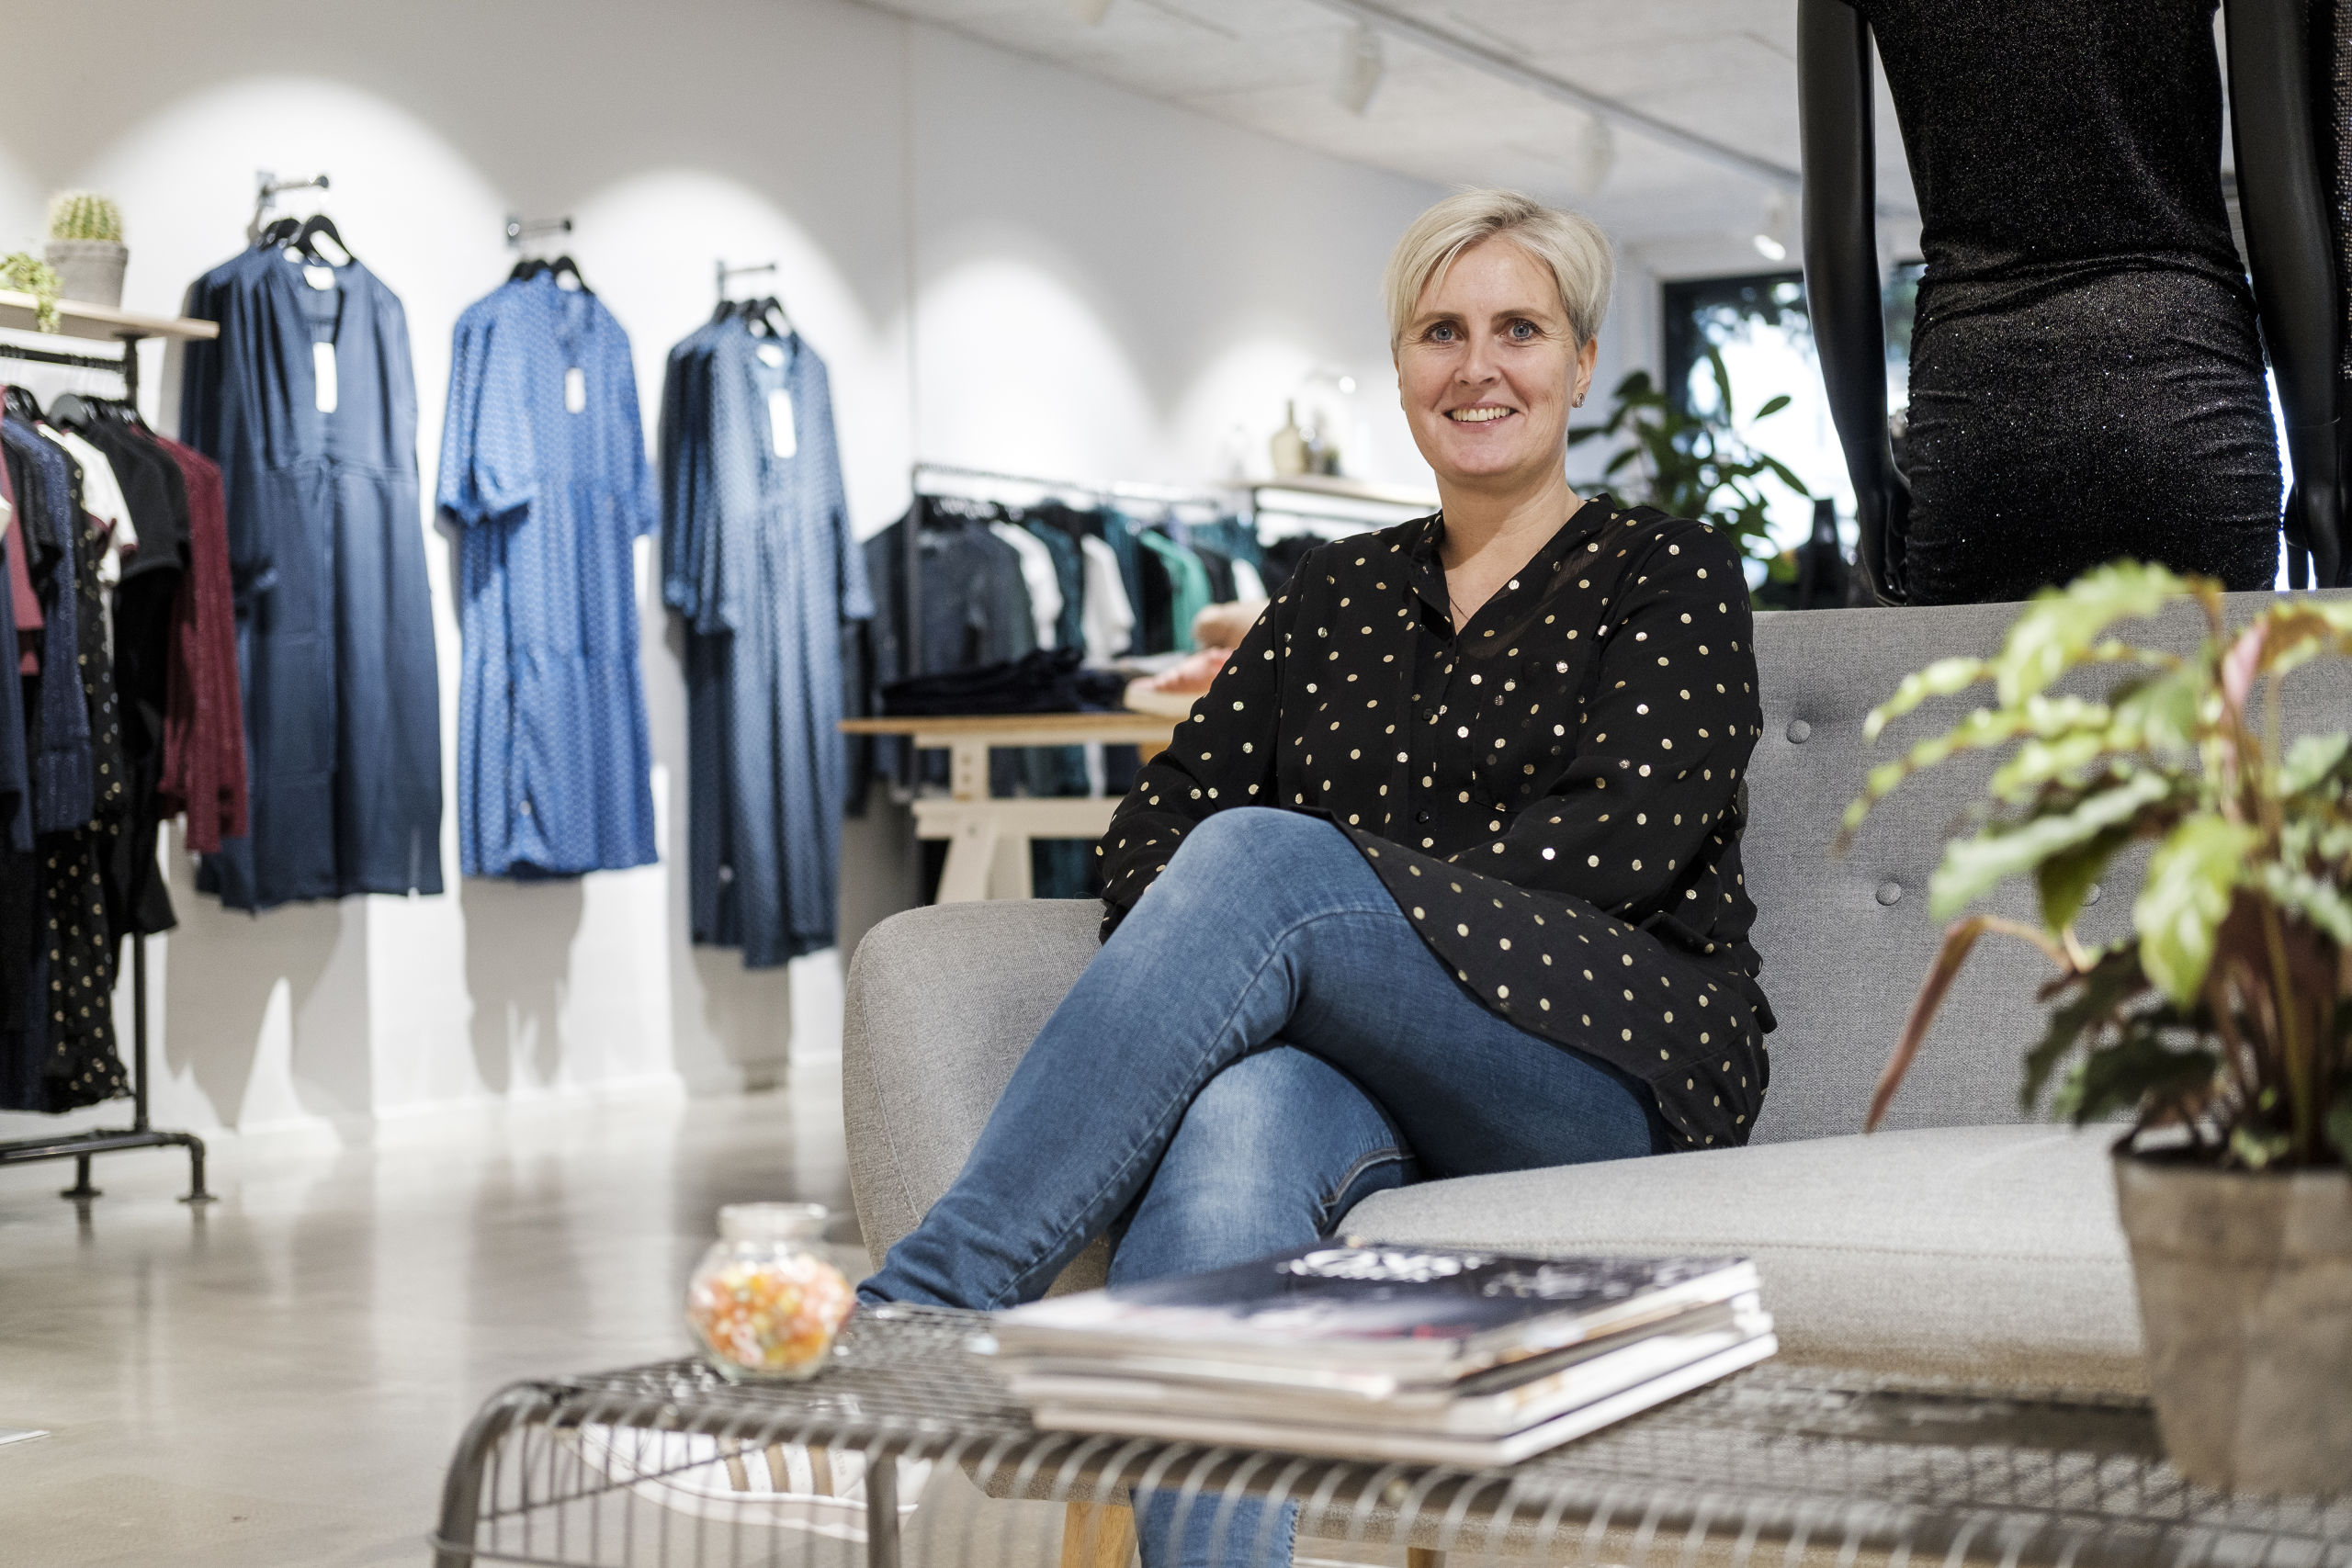 Lise har overtaget kendt tøjbutik i midtbyen